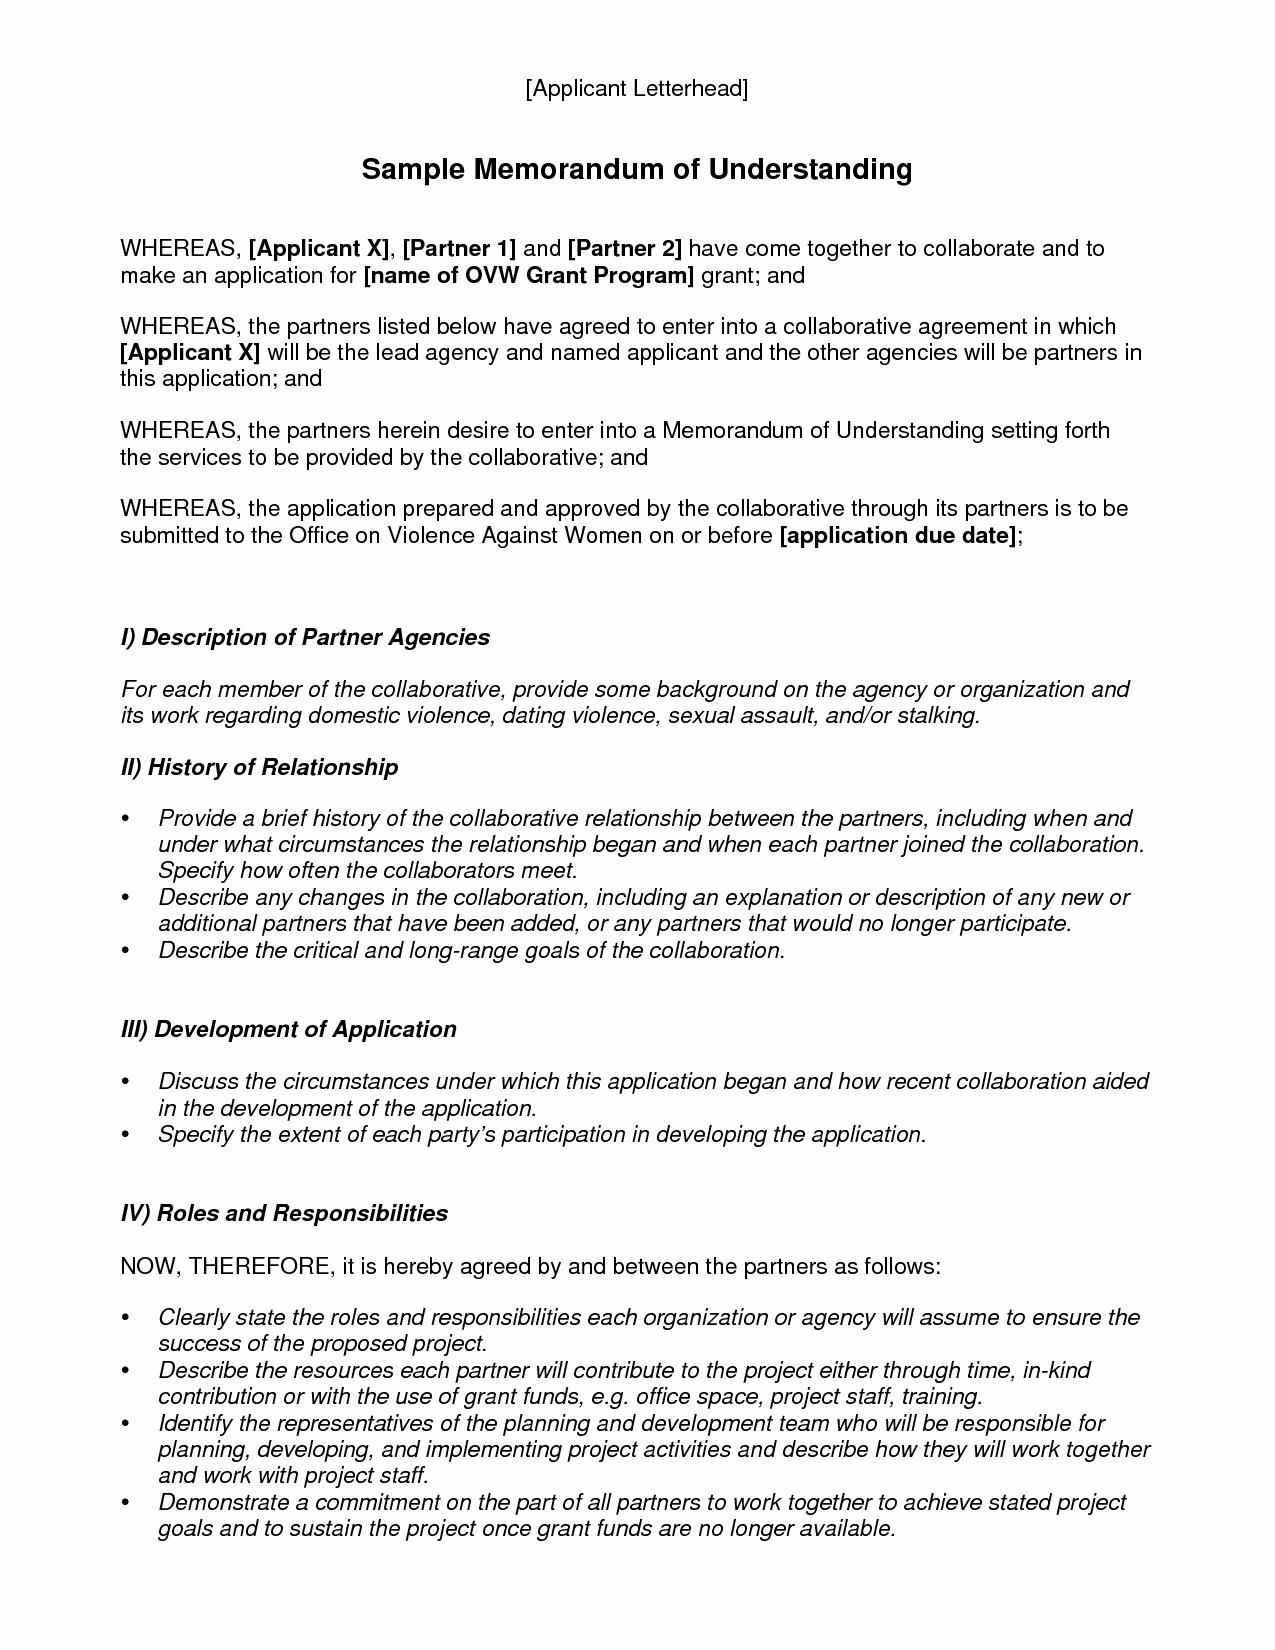 Letter Of Understanding Template Fresh Memorandum Understanding Template